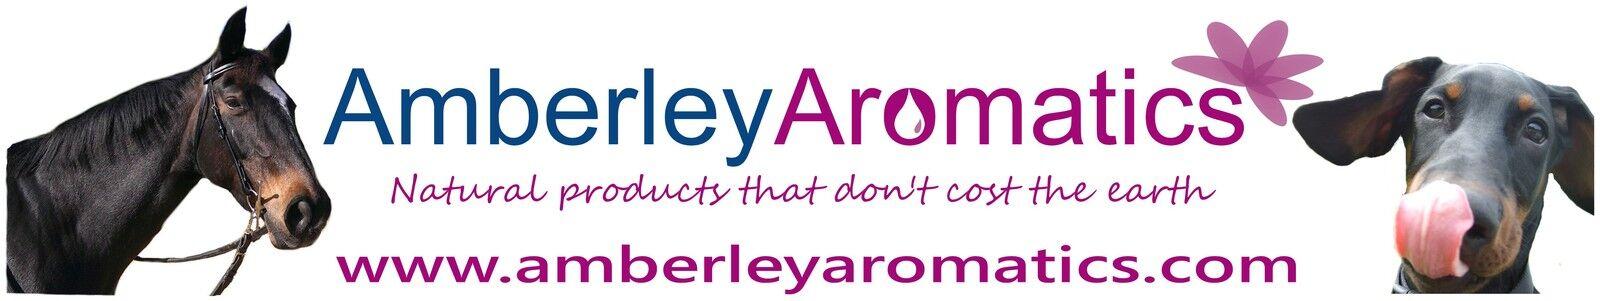 Amberley Aromatics